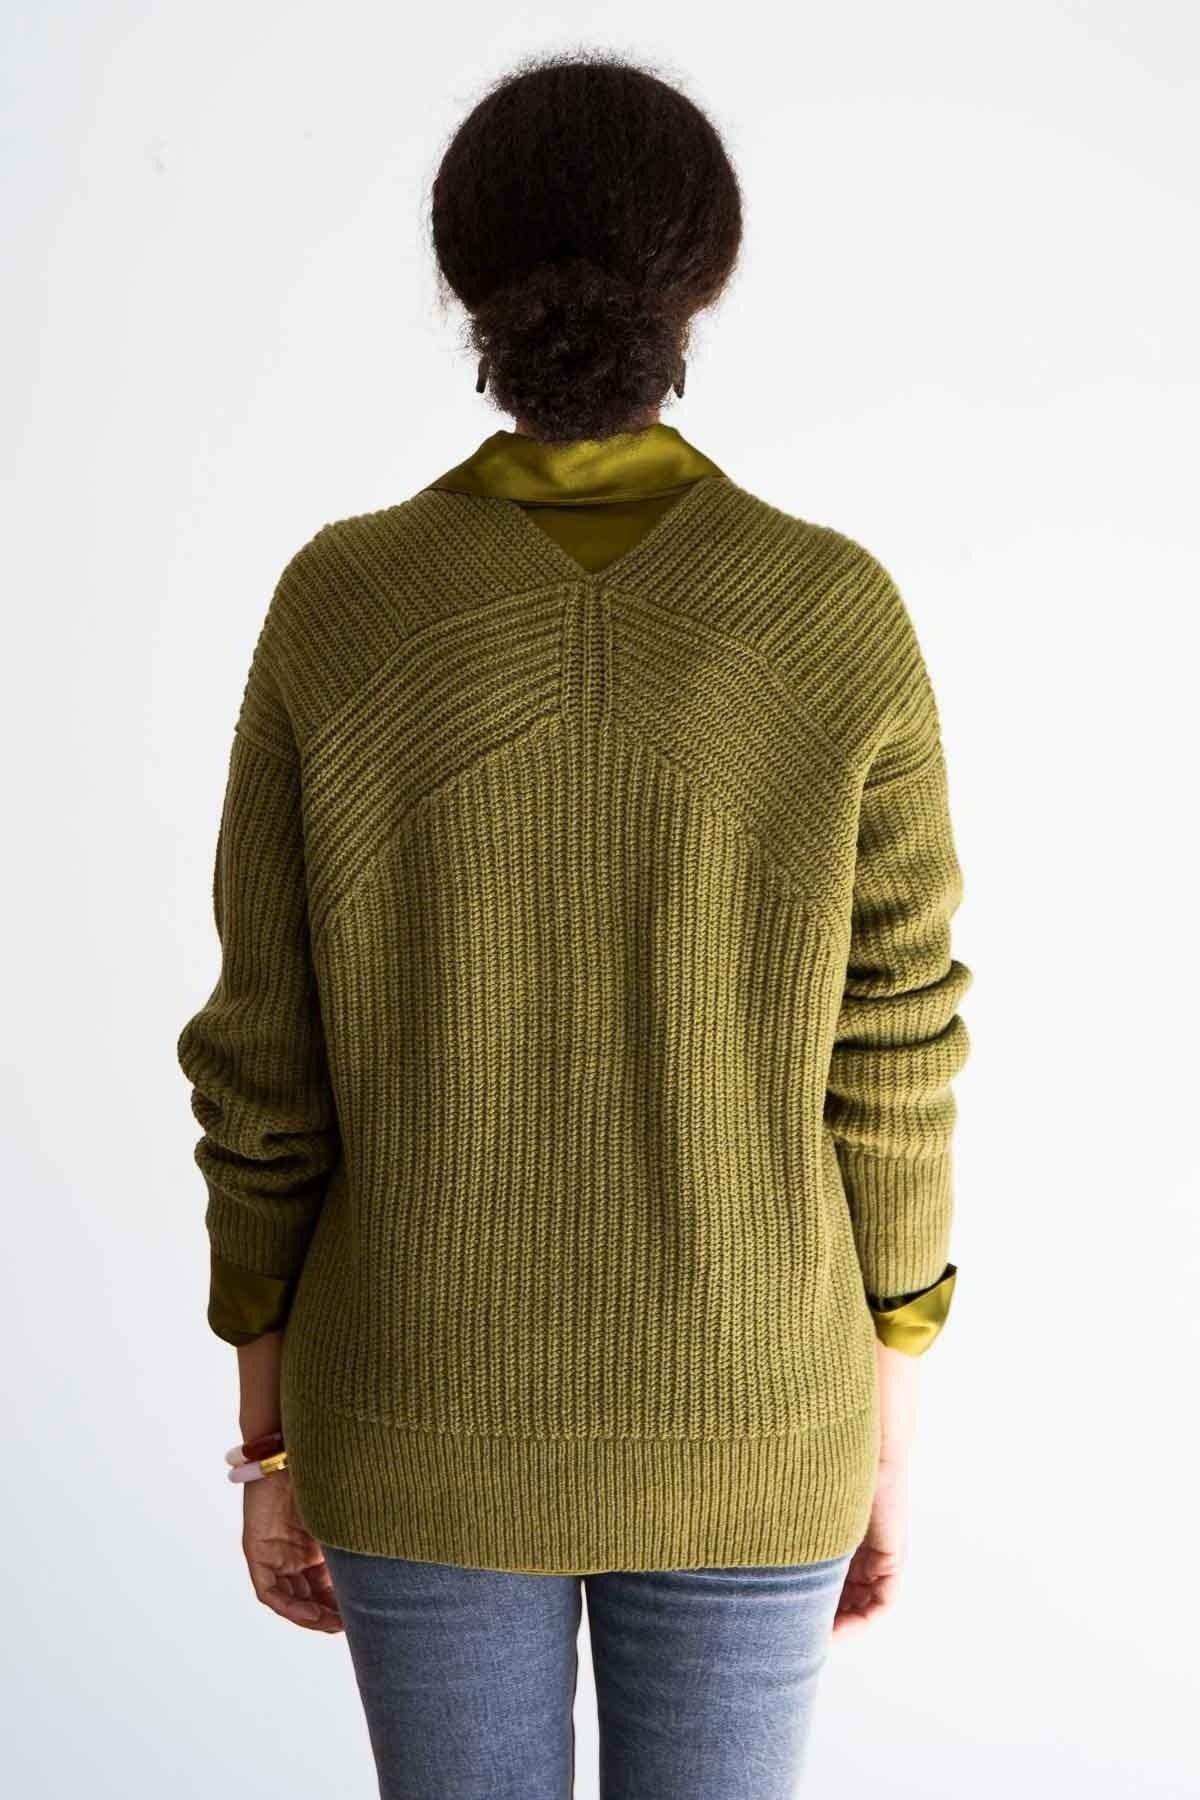 form fitting genser gul